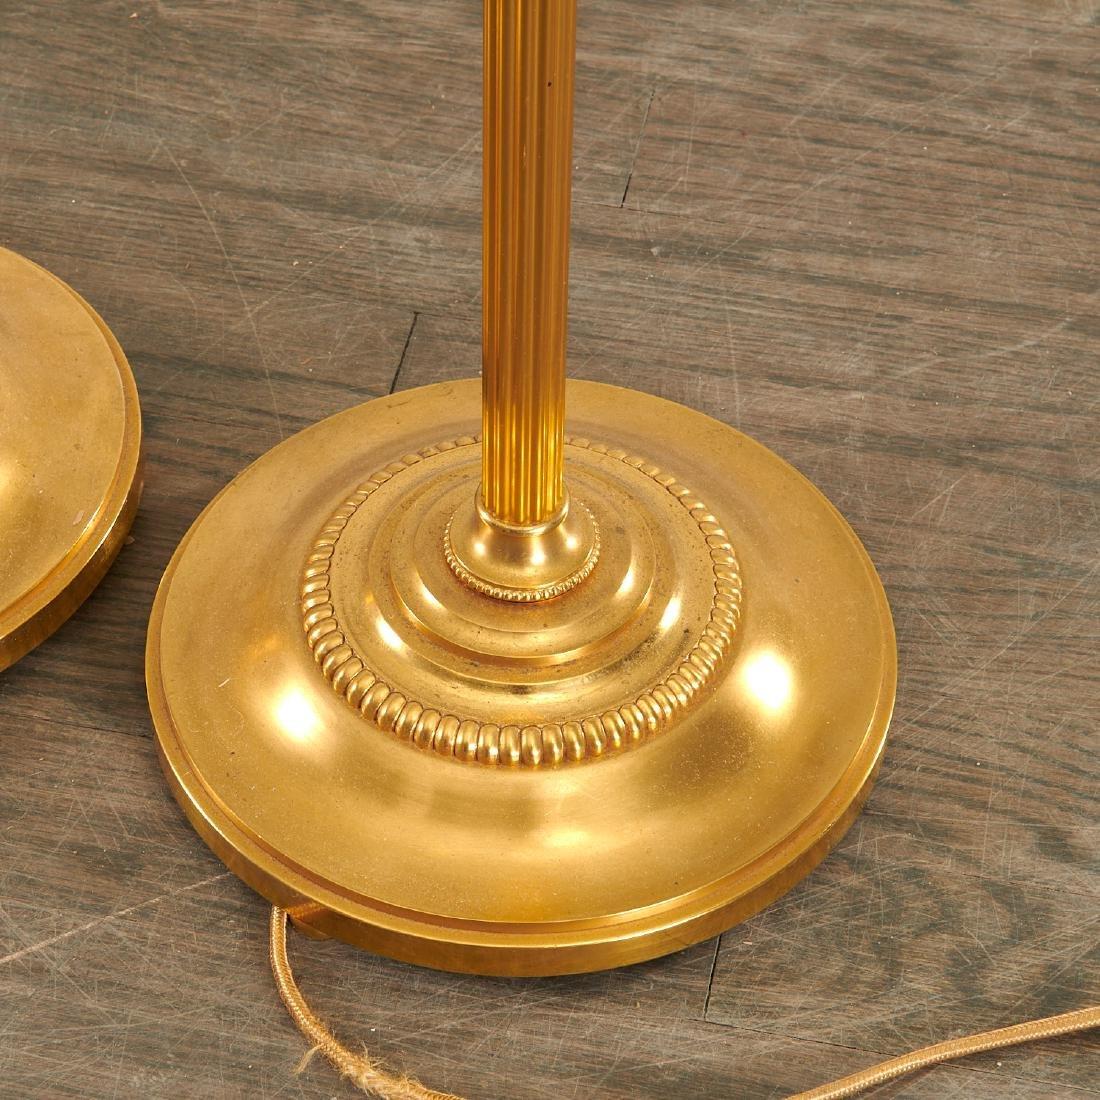 Quality pair bronze swing arm floor lamps - 5